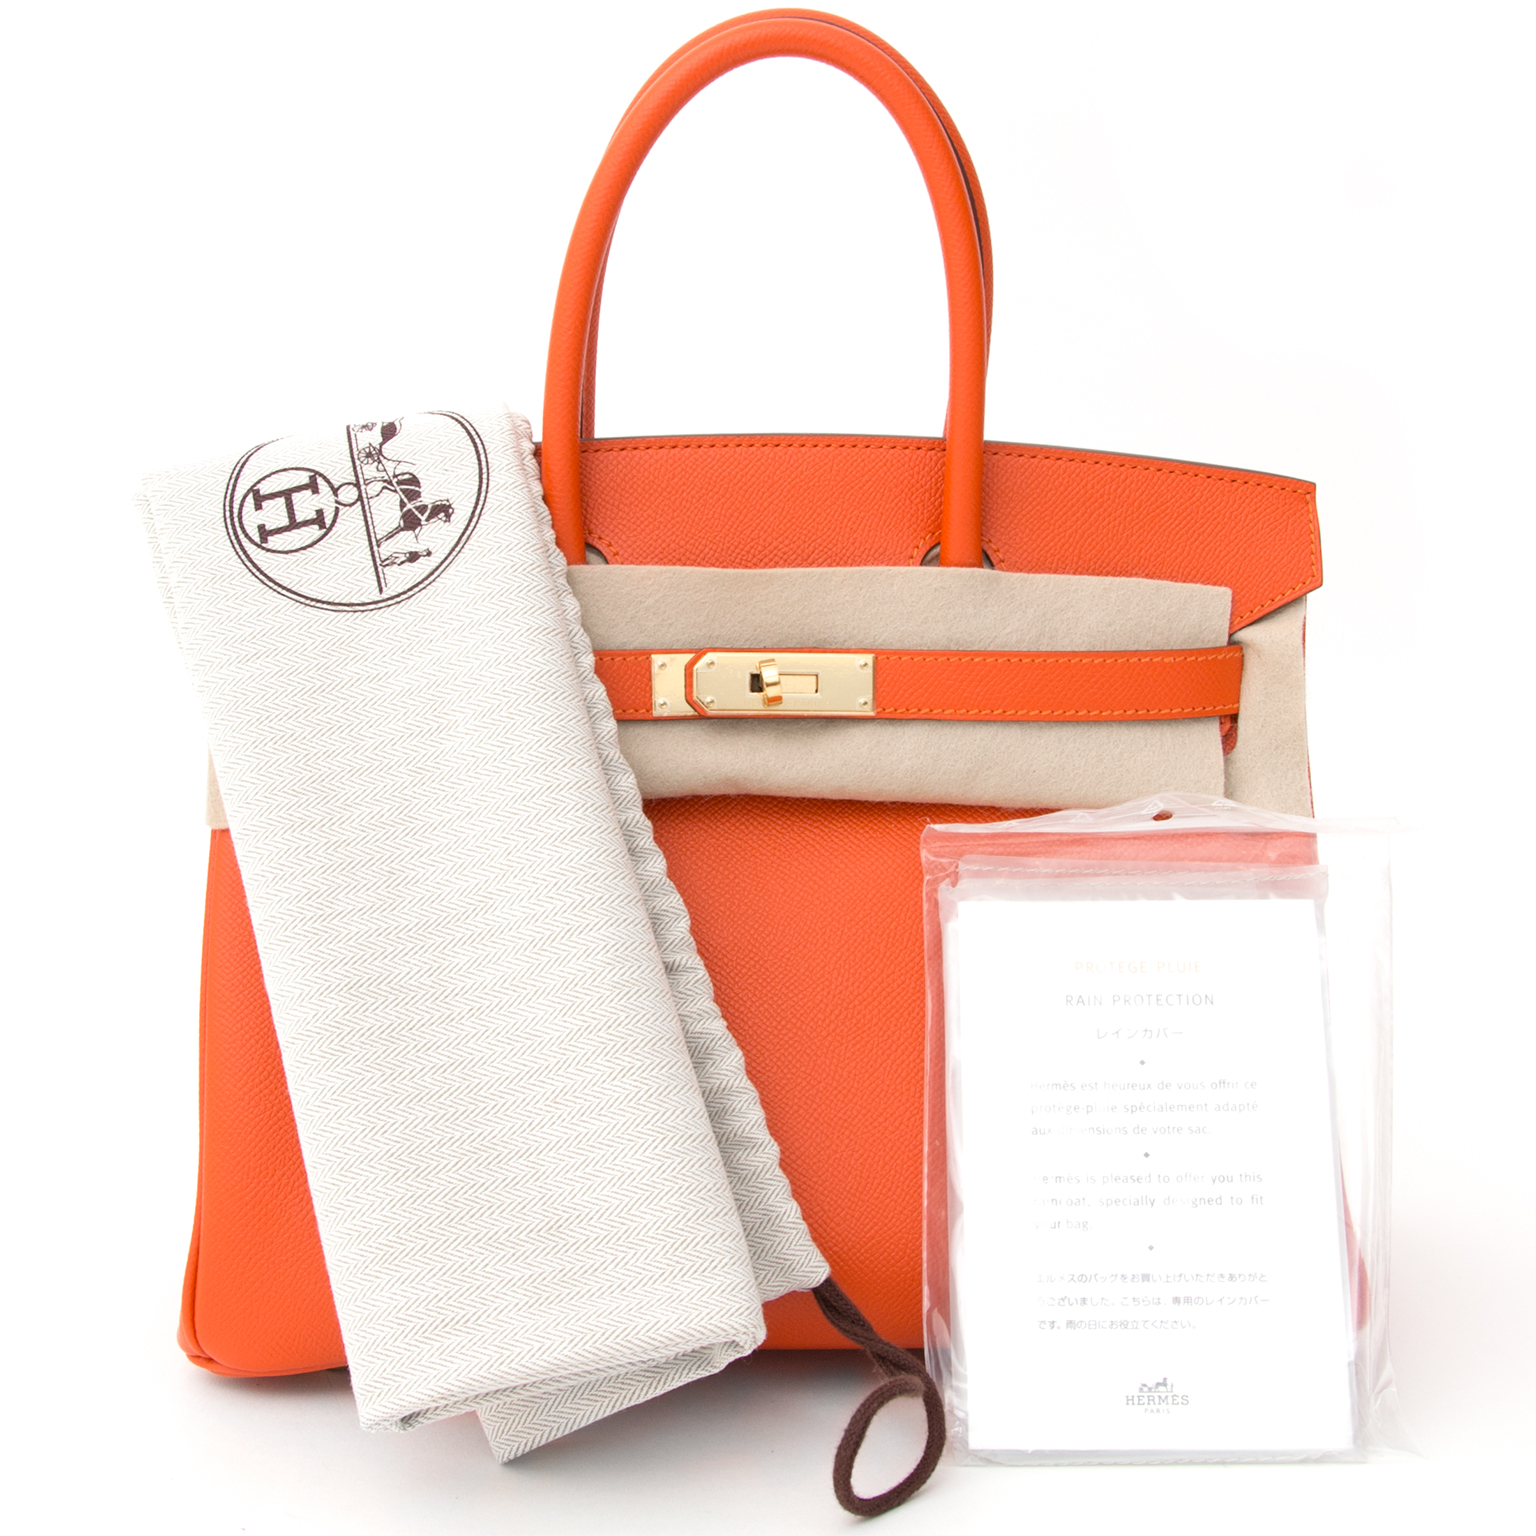 feebcf9249ec ... acheter en ligne seconde main sac a main Brand New Hermes Birkin 30  Epson Feu GHW